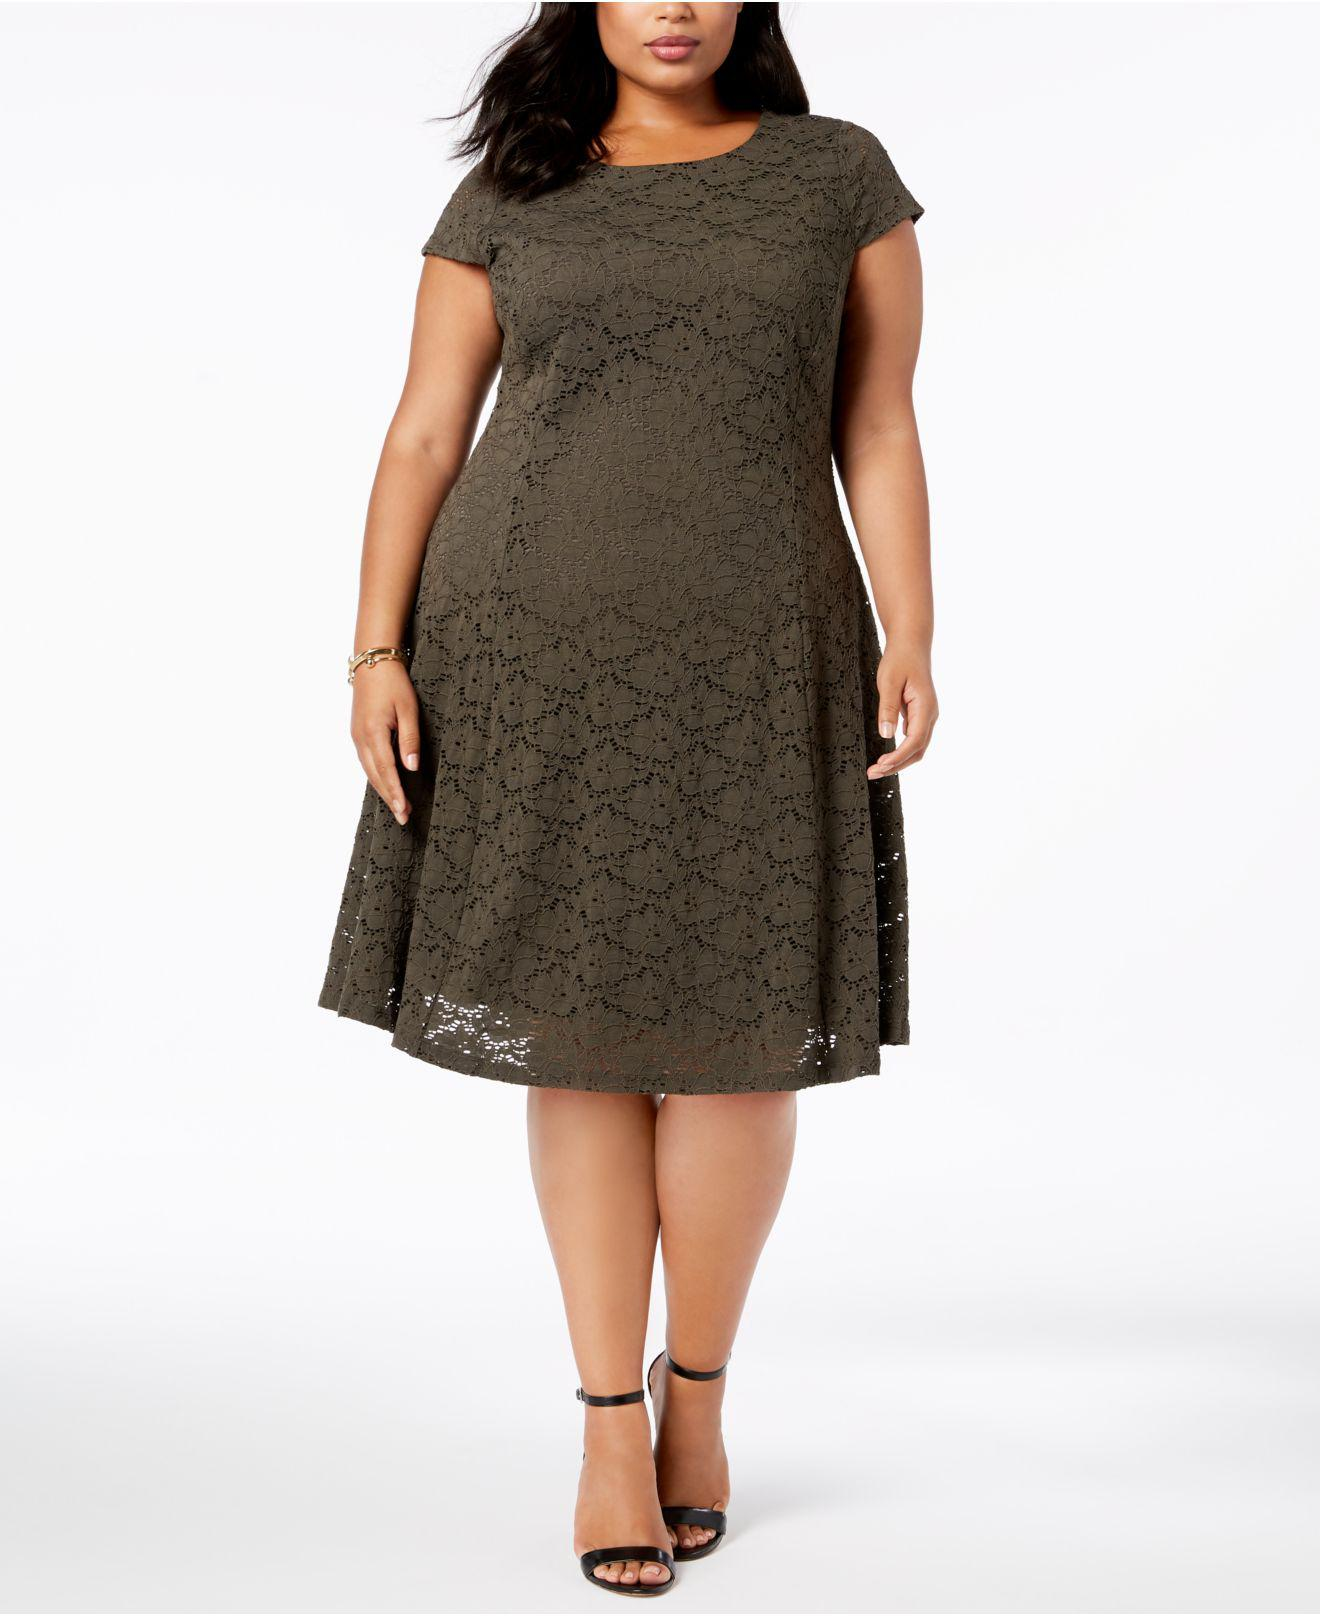 bdf466c85bf3 Plus Size Formal Dresses Macys - Barrier Surveillance